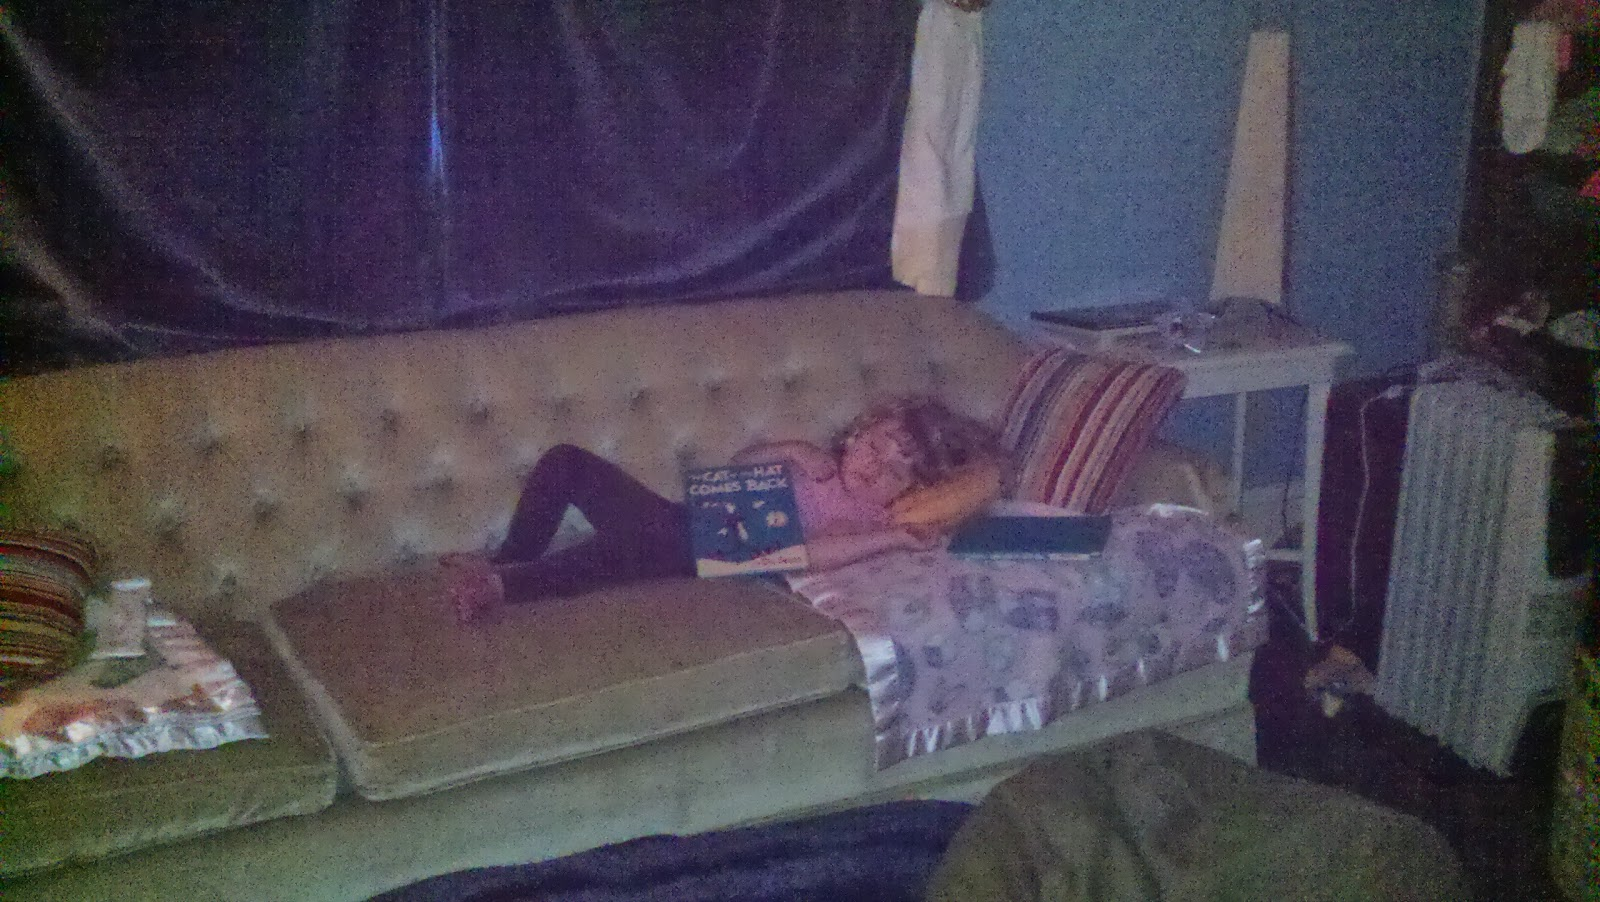 sam and cat sofa bed trick kingpets comfortable dog large sv appa